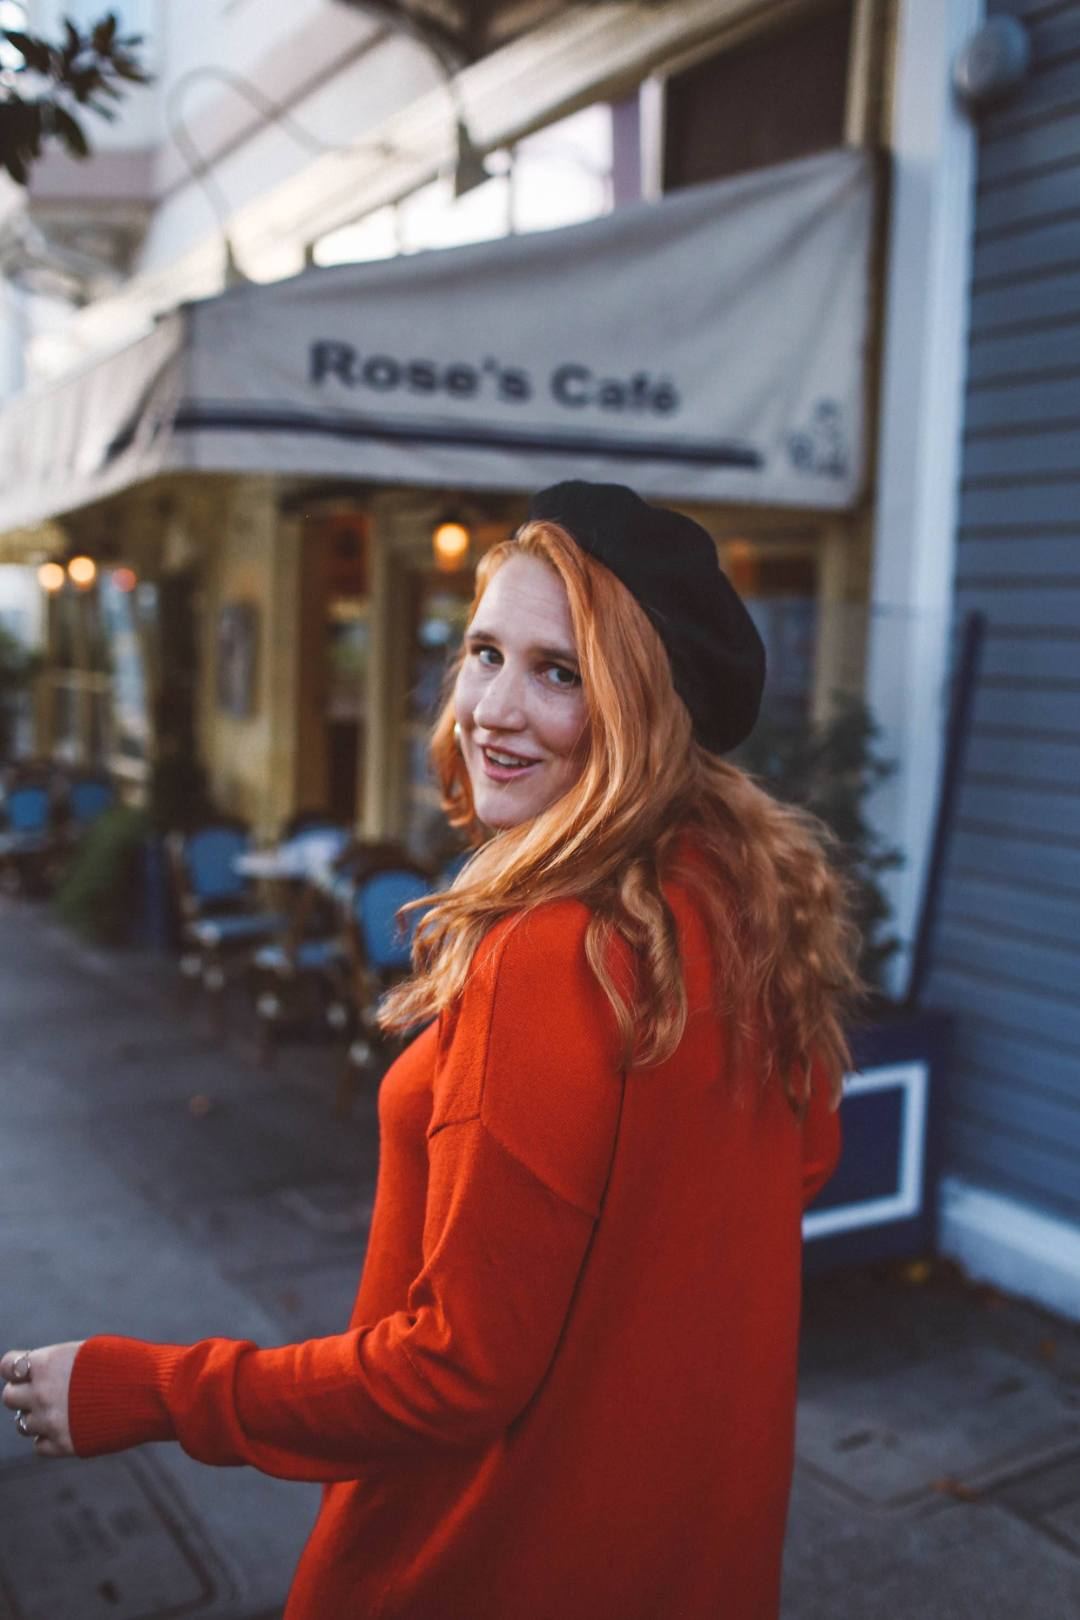 red sweater dress beret rose's cafe san francisco